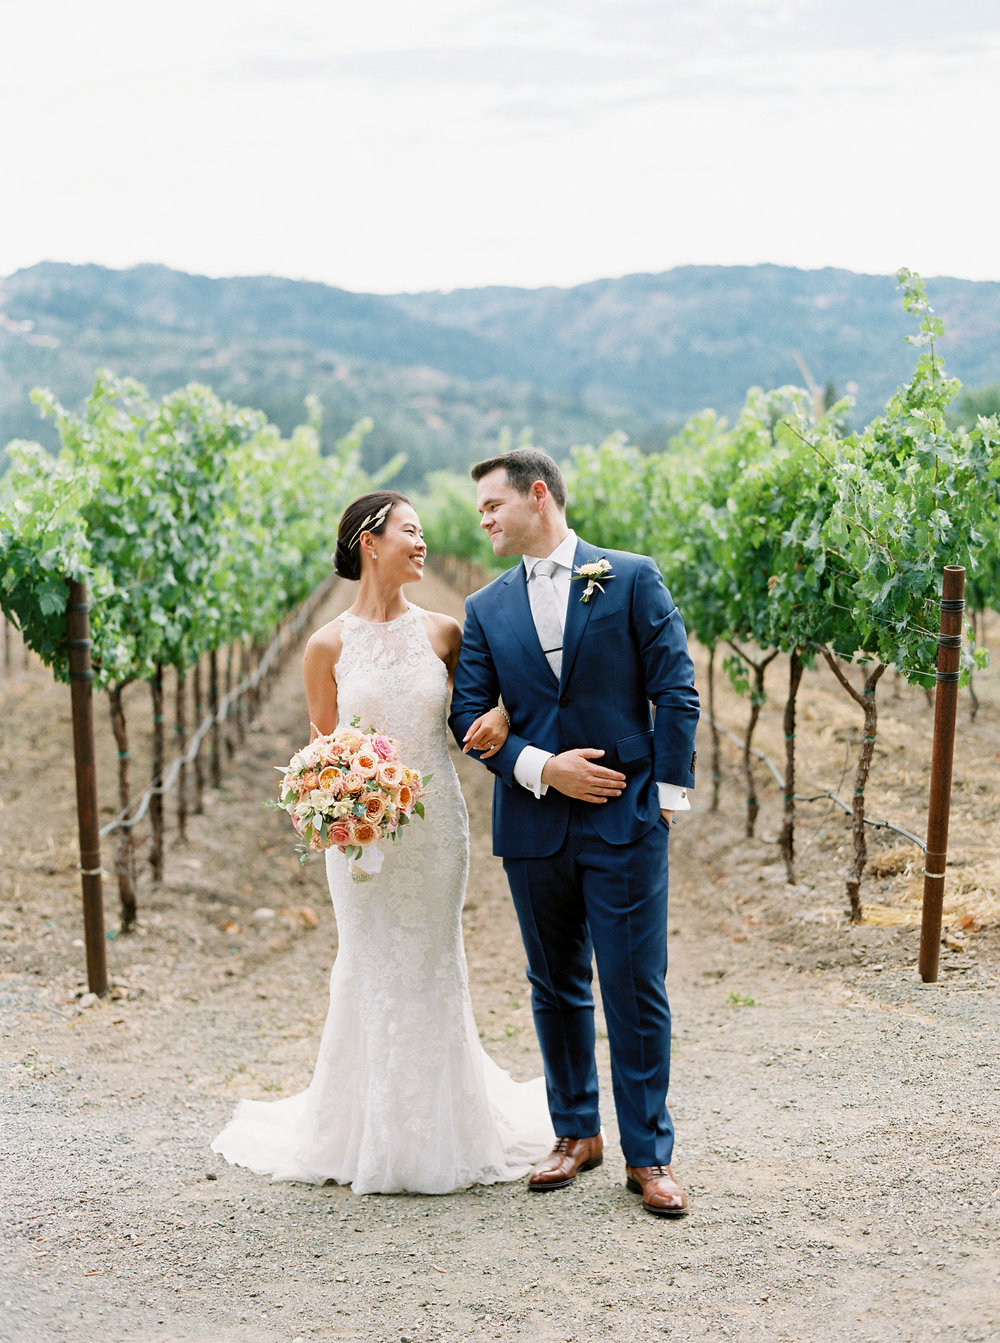 Harvest-inn-wedding-in-napa-california-248.jpg